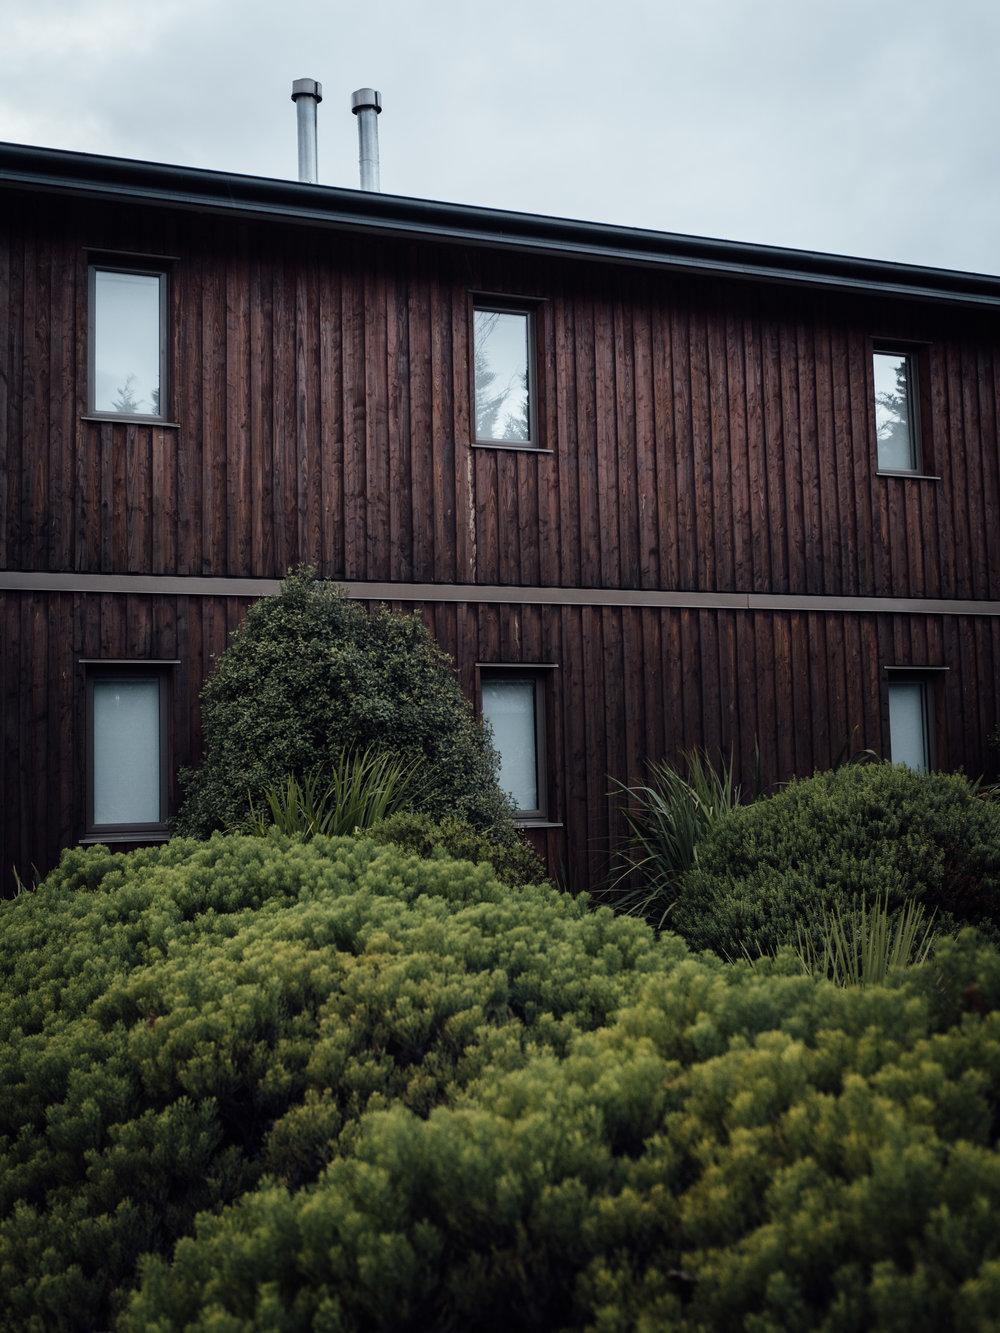 Simple Architecture  |9.4.17| Wanaka, New Zealand